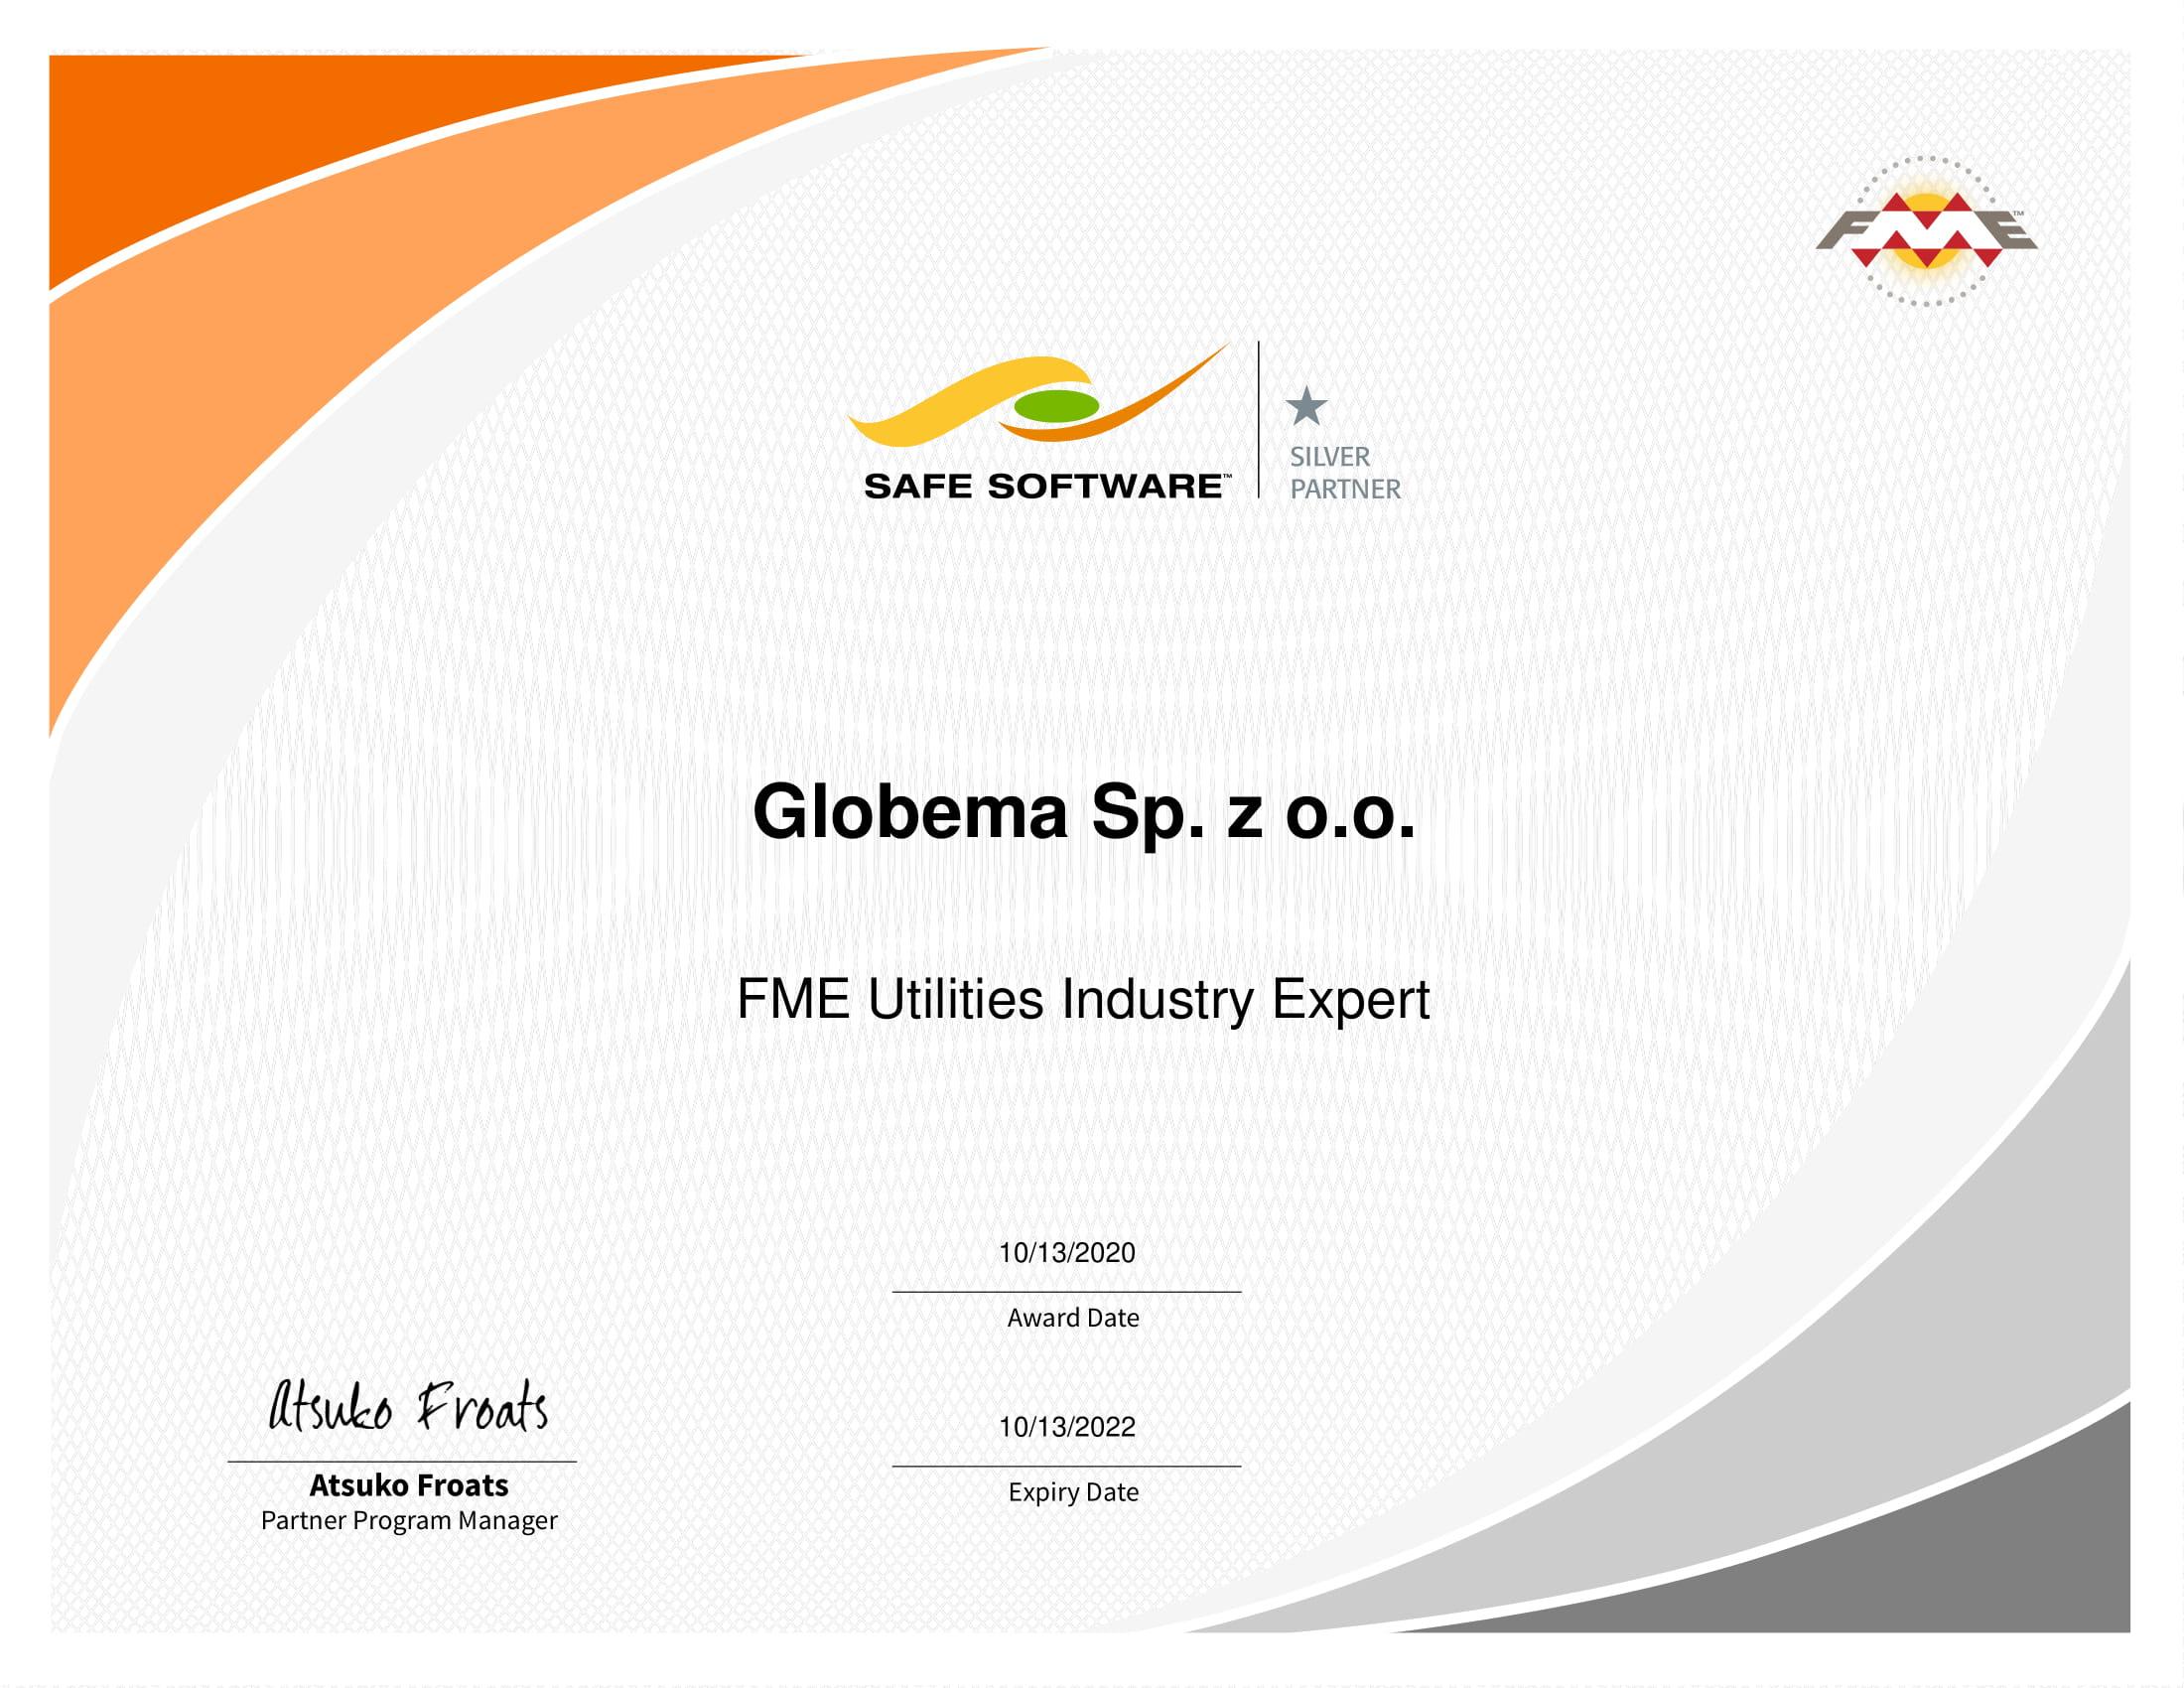 Globema - Utilities